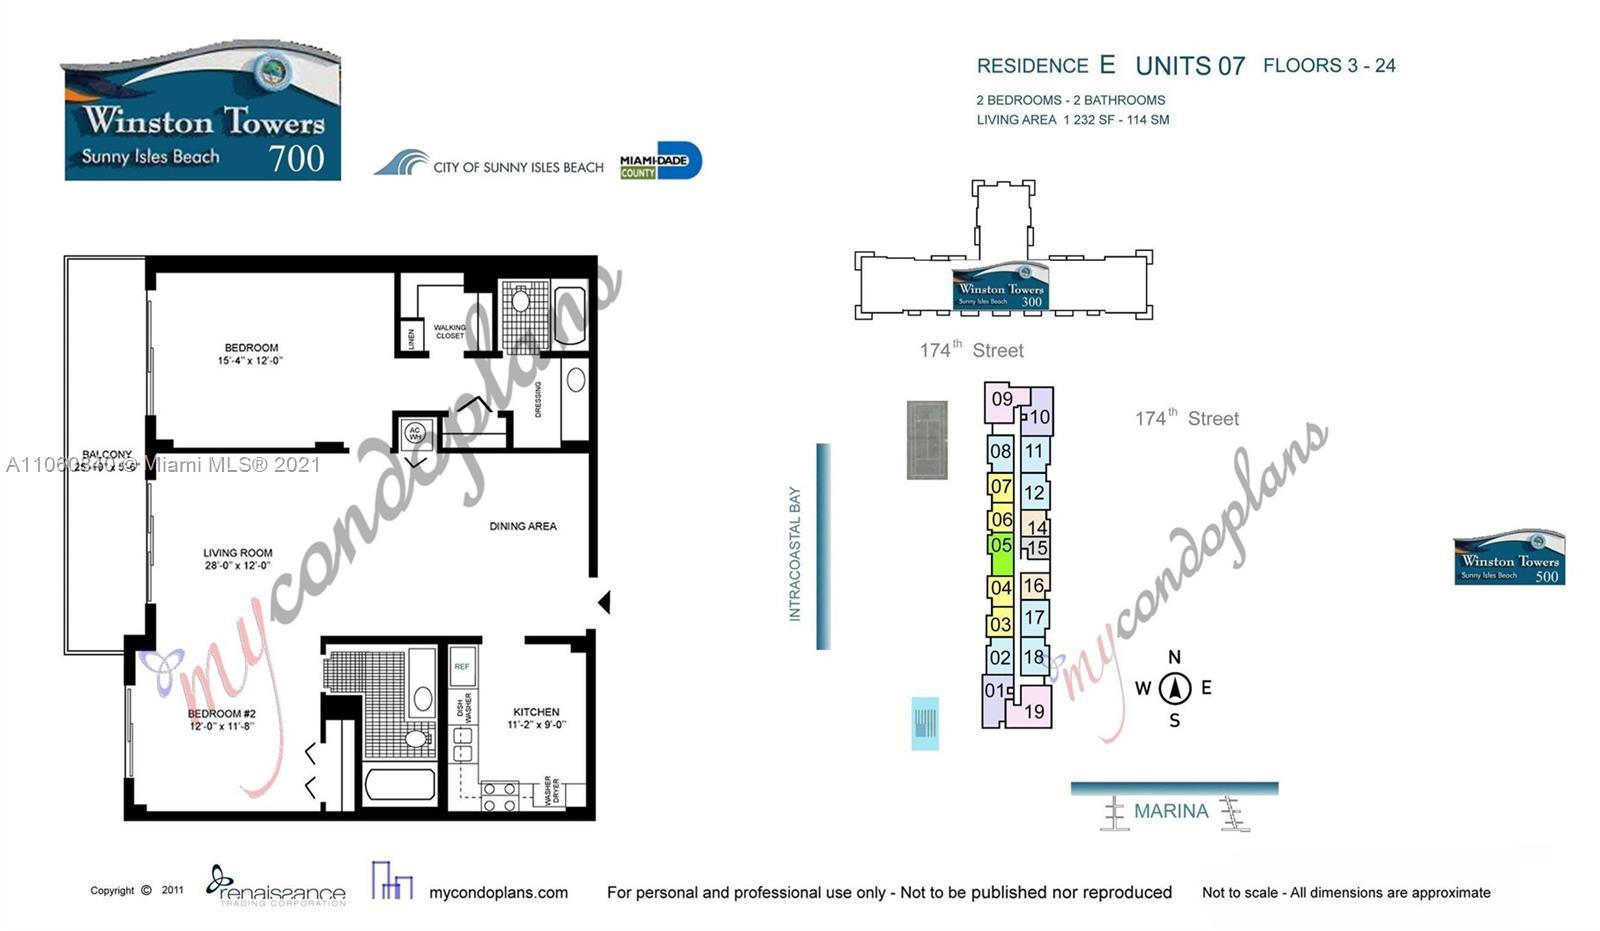 Winston Tower 700 #307 - 290 174th St #307, Sunny Isles Beach, FL 33160